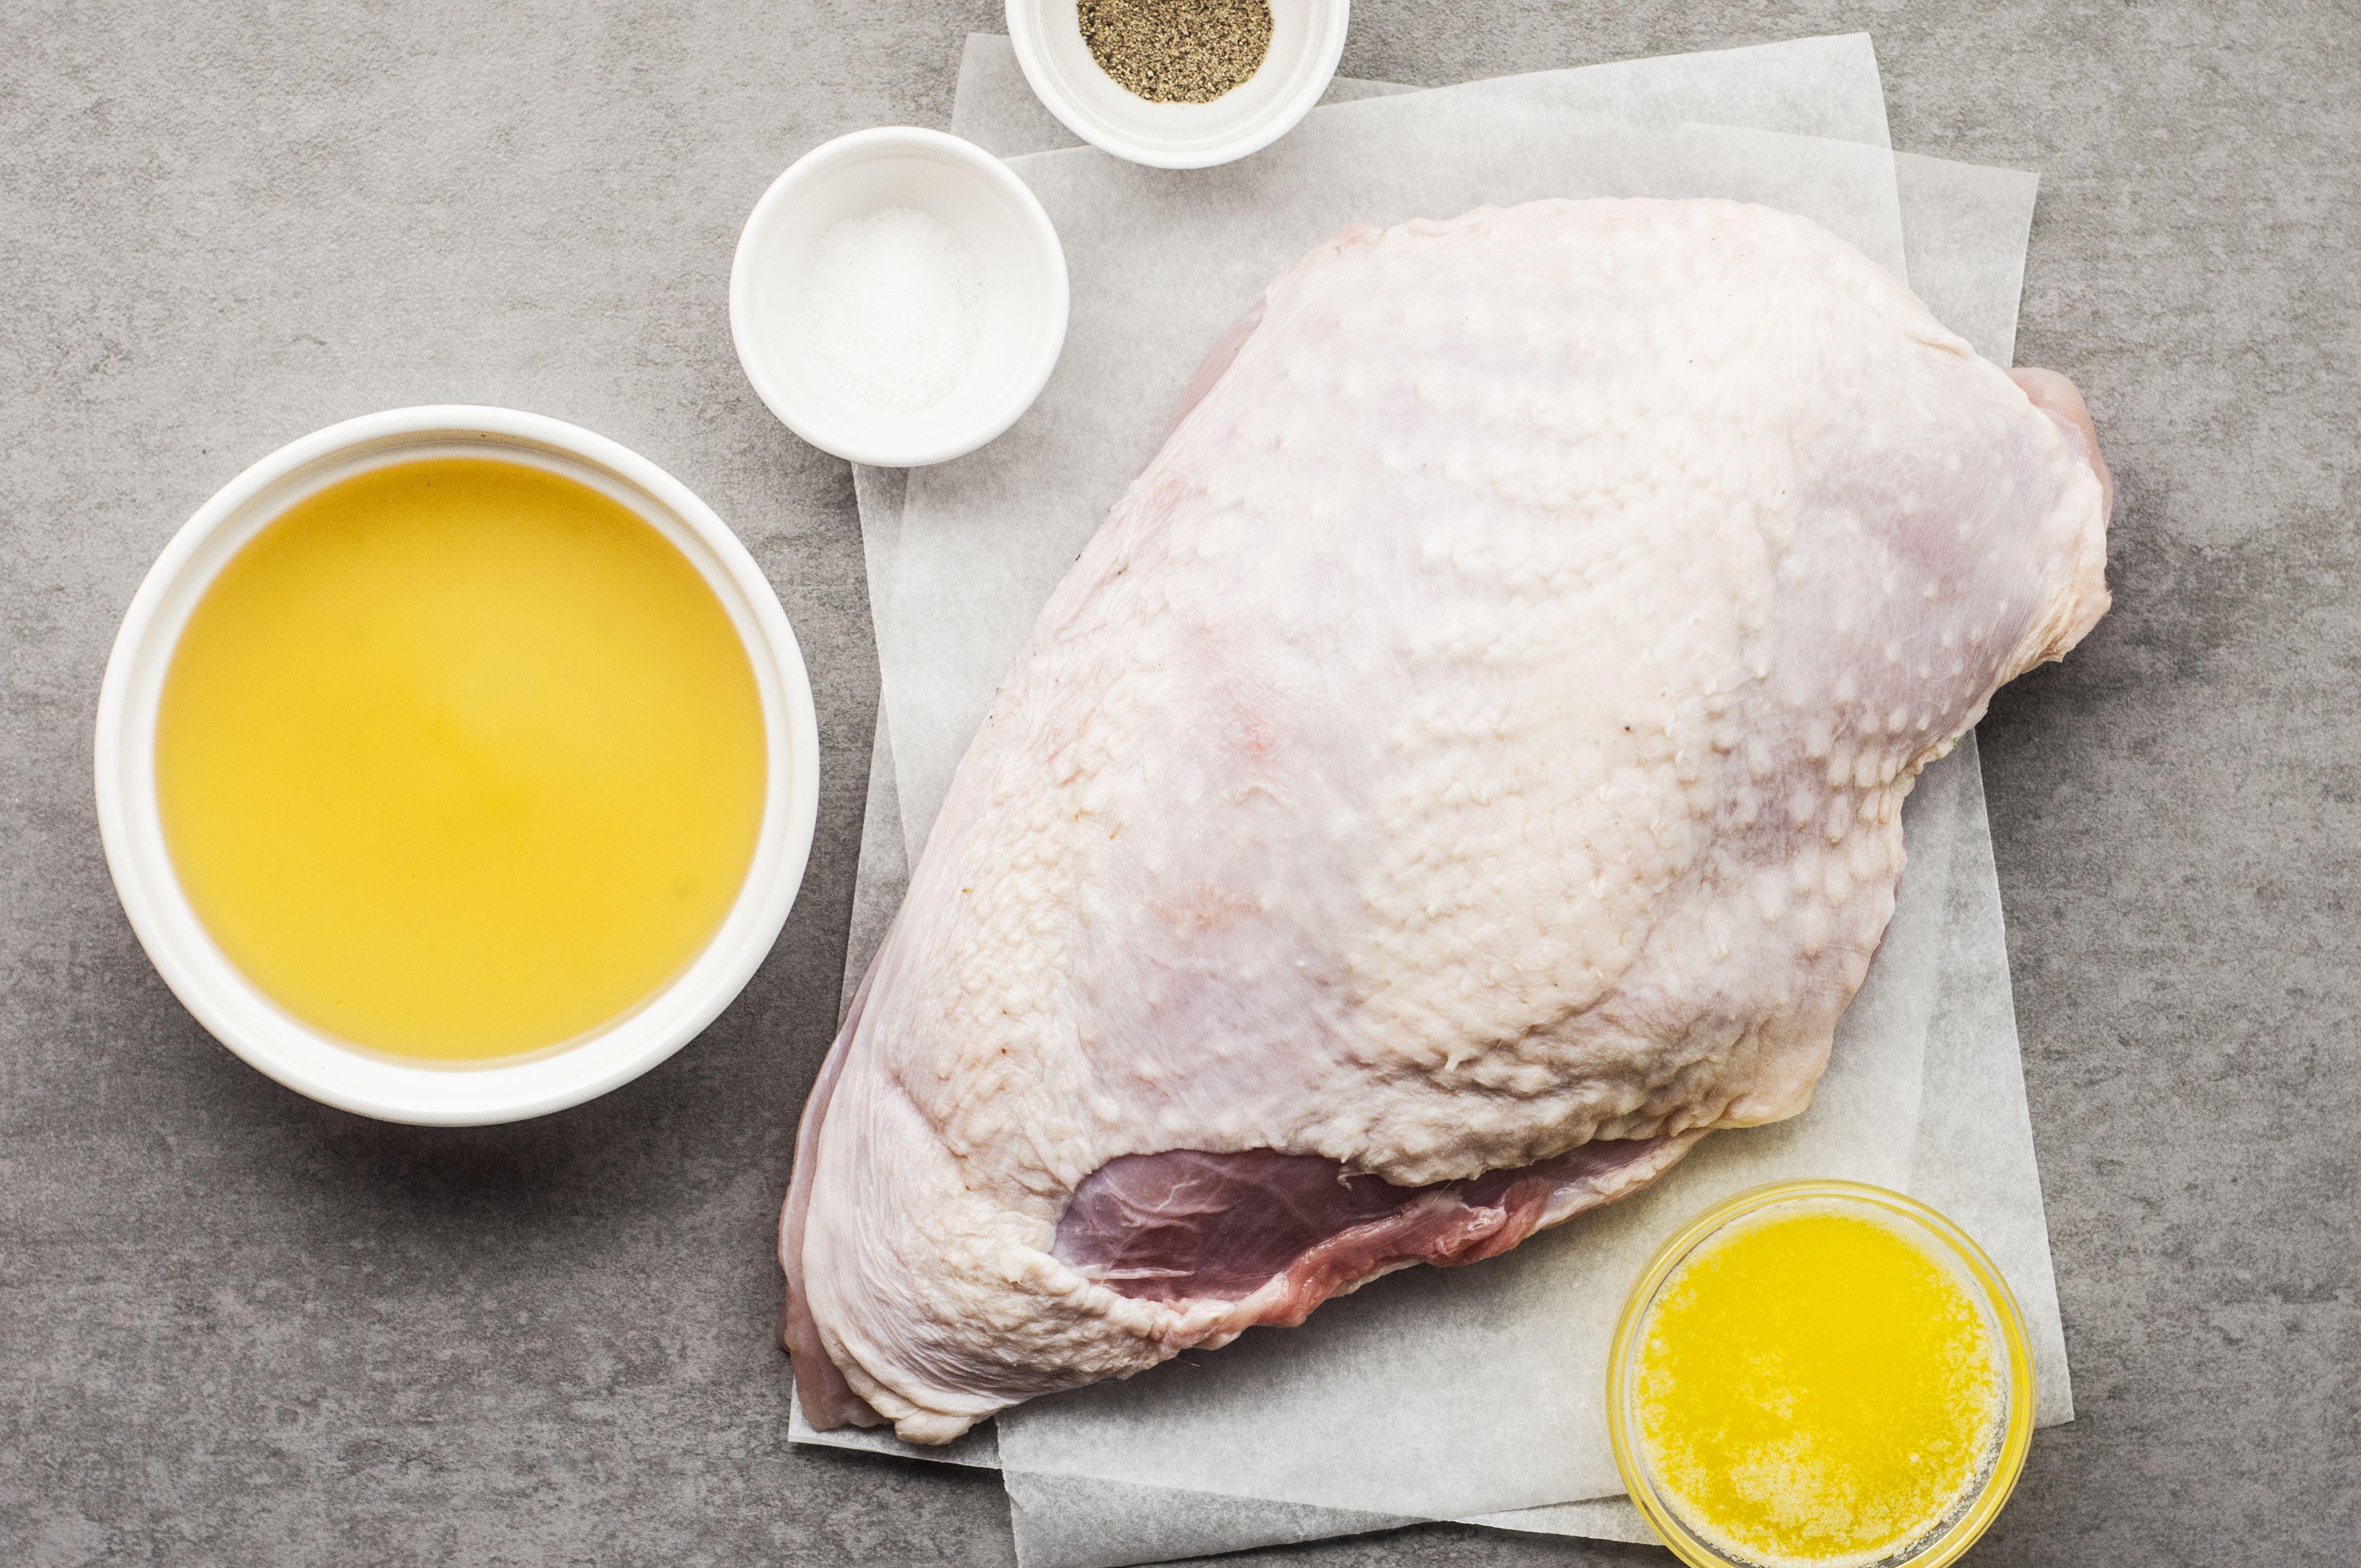 Roast turkey breast recipe ingredients